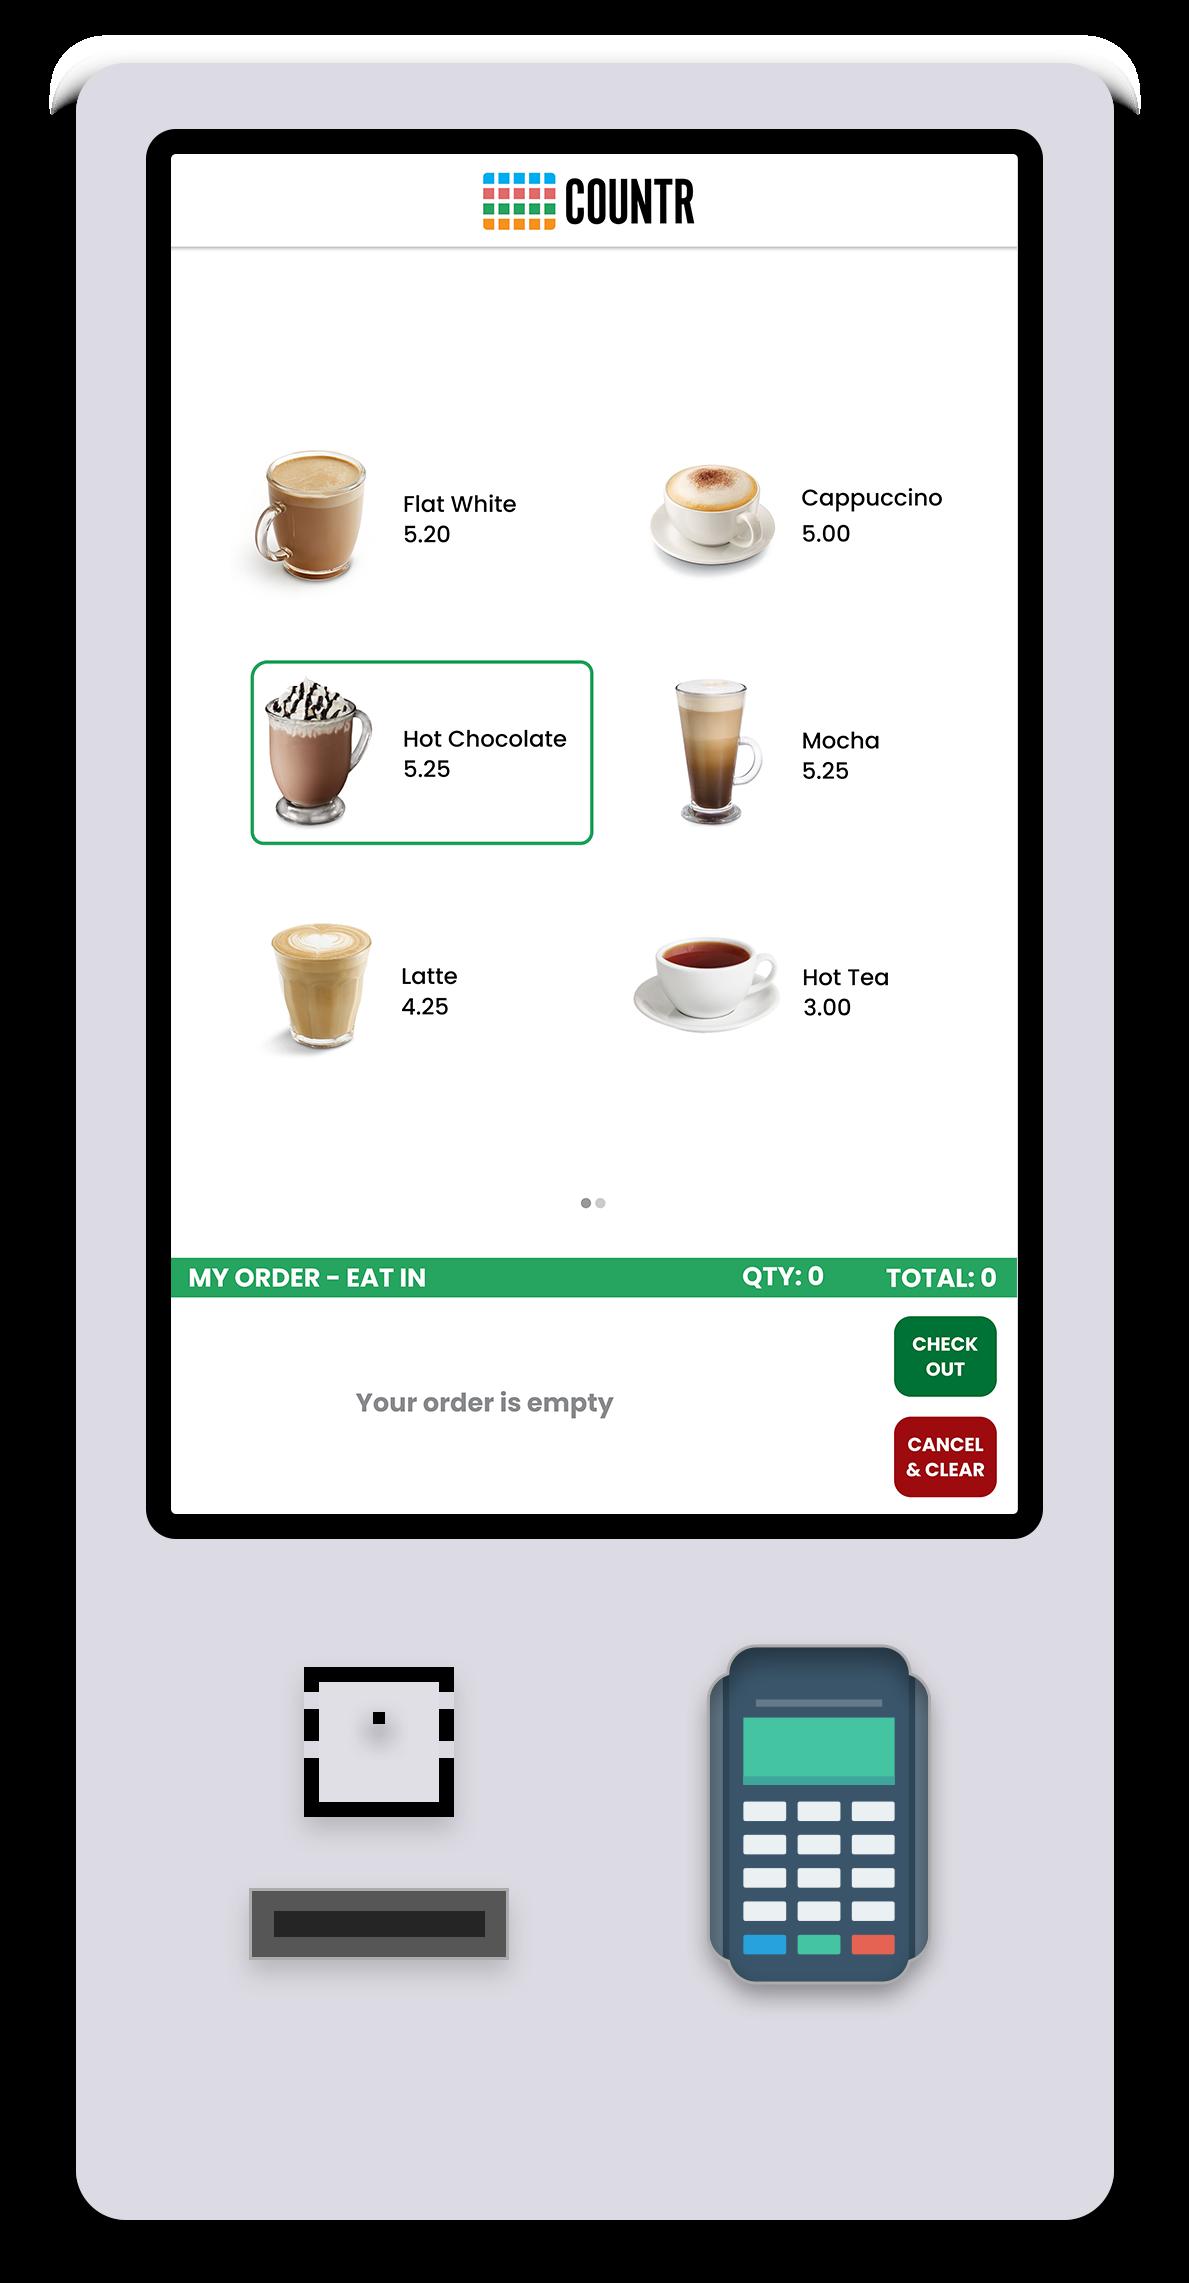 self service kiosk demo countr_product page